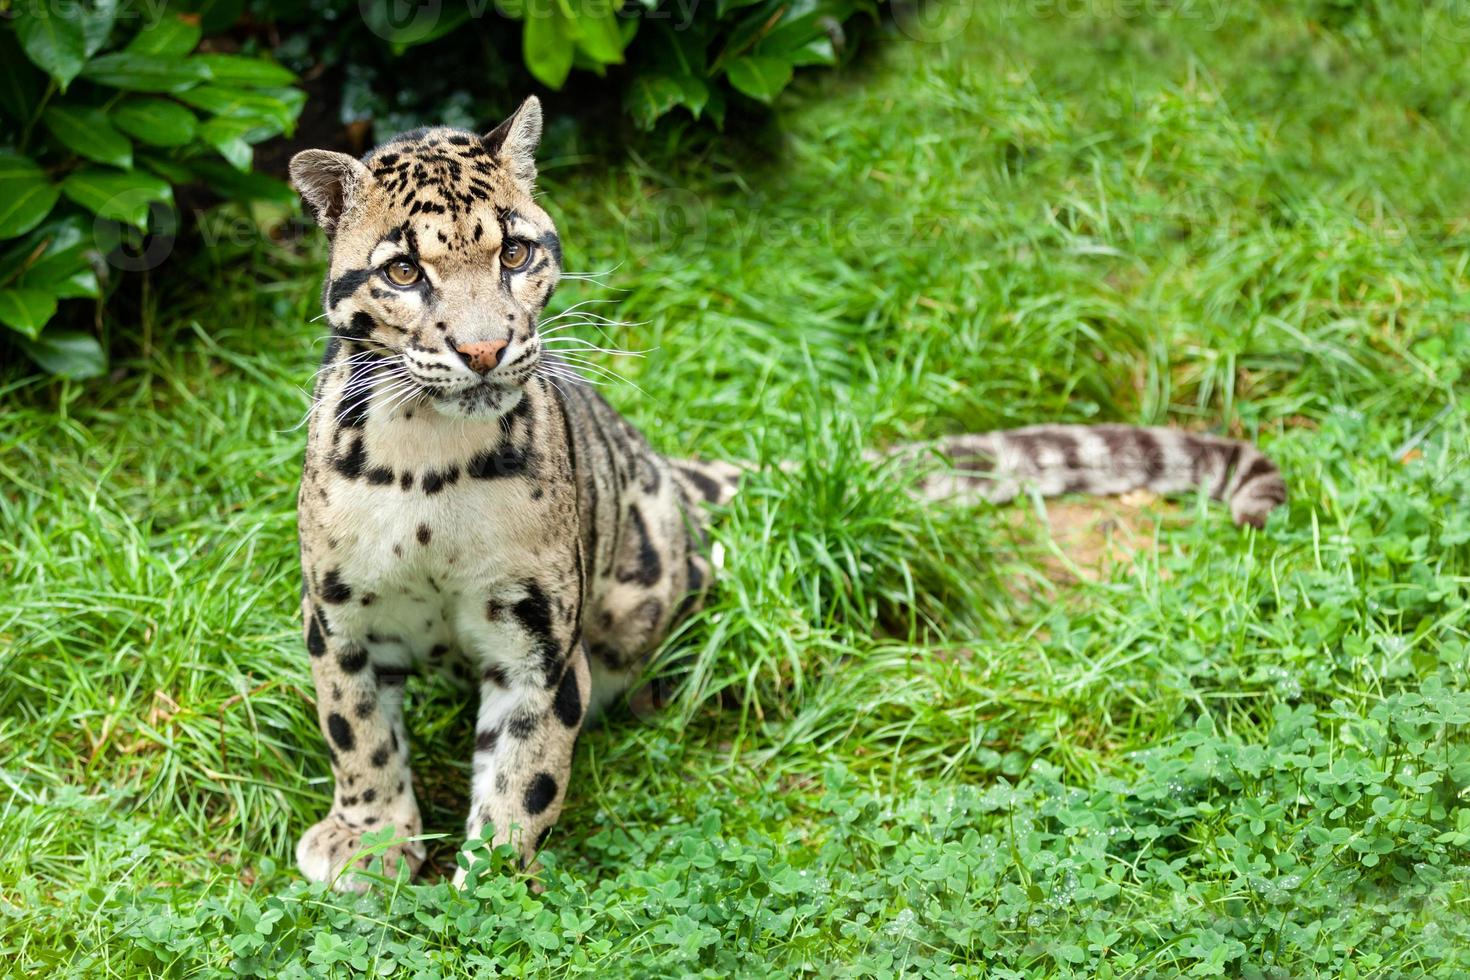 léopard opacifié stitting on grass pensive photo